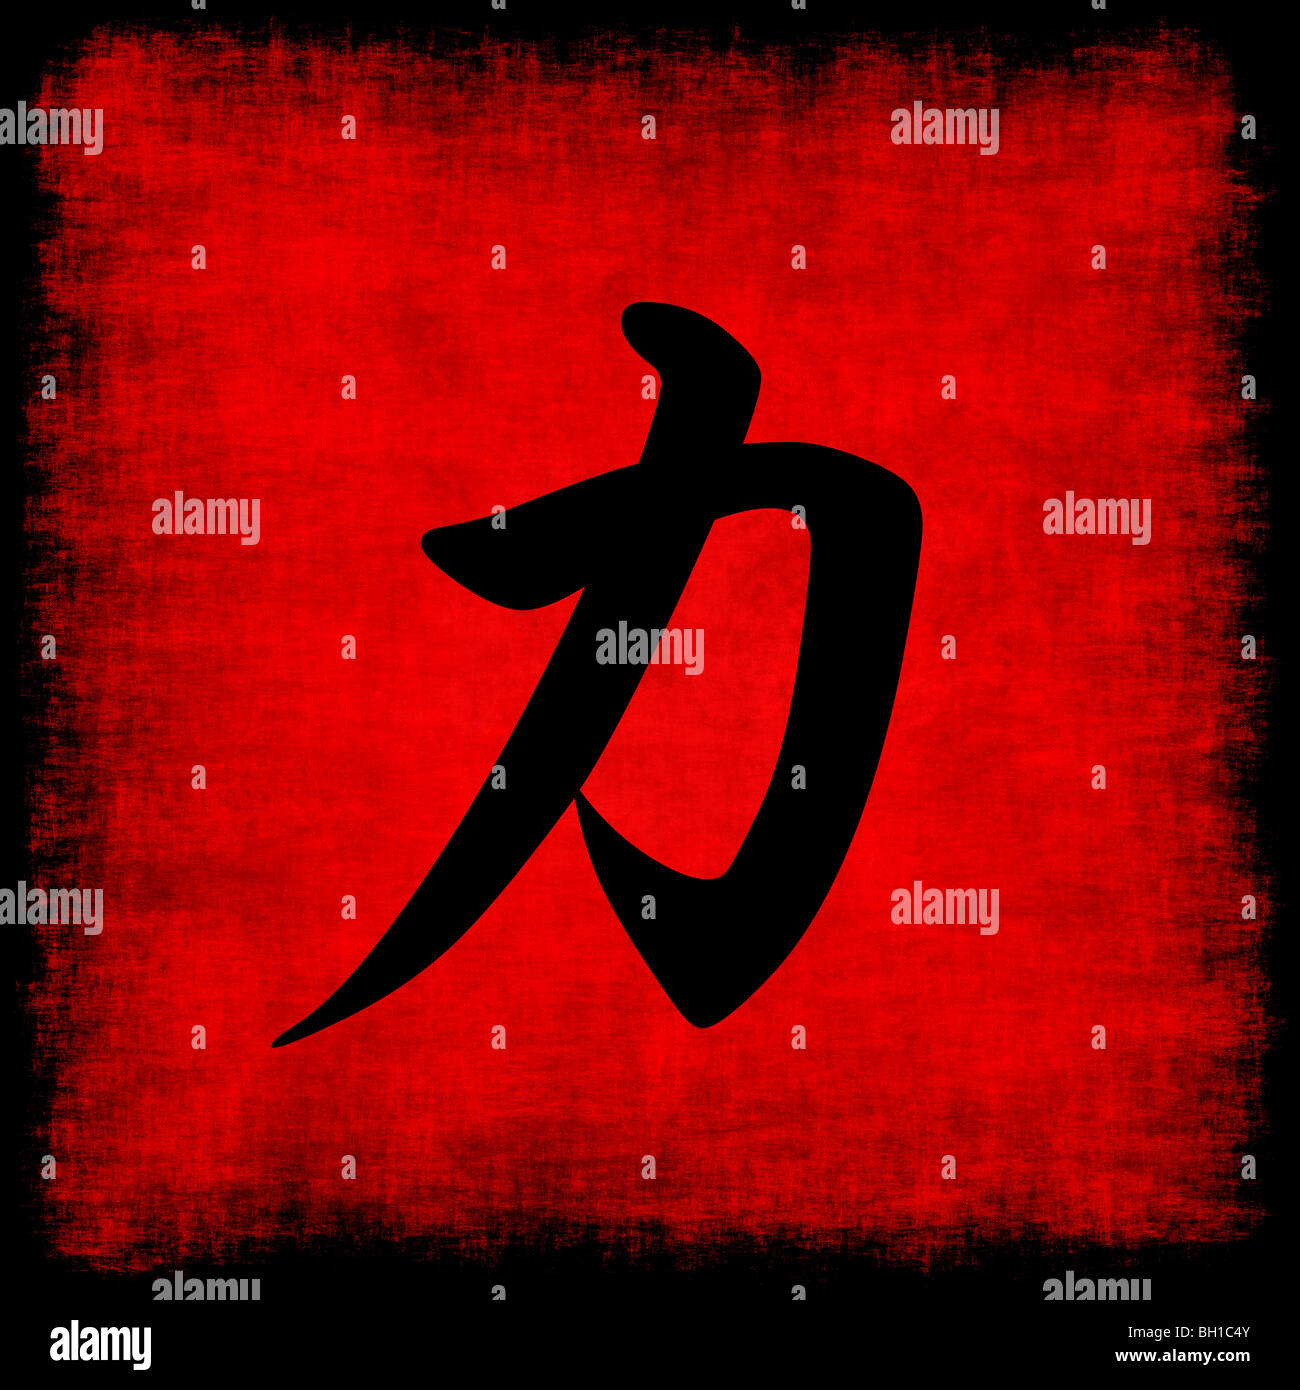 Strength chinese calligraphy symbol grunge background set stock strength chinese calligraphy symbol grunge background set buycottarizona Image collections